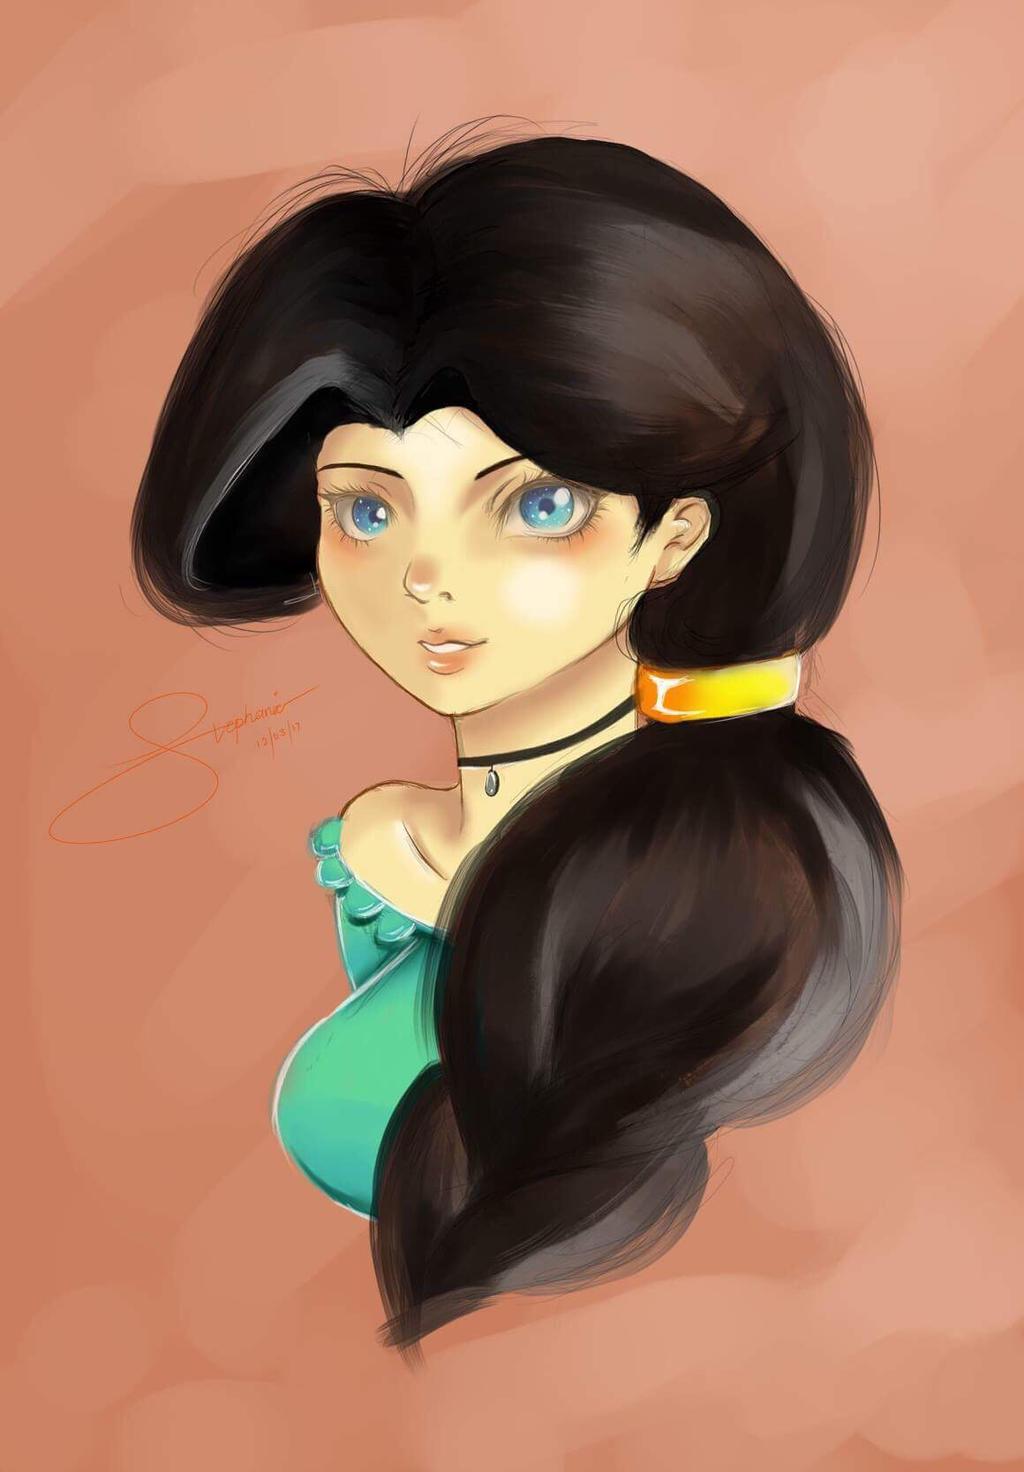 Jasmine ver. 2 (?) by ReoAkamine